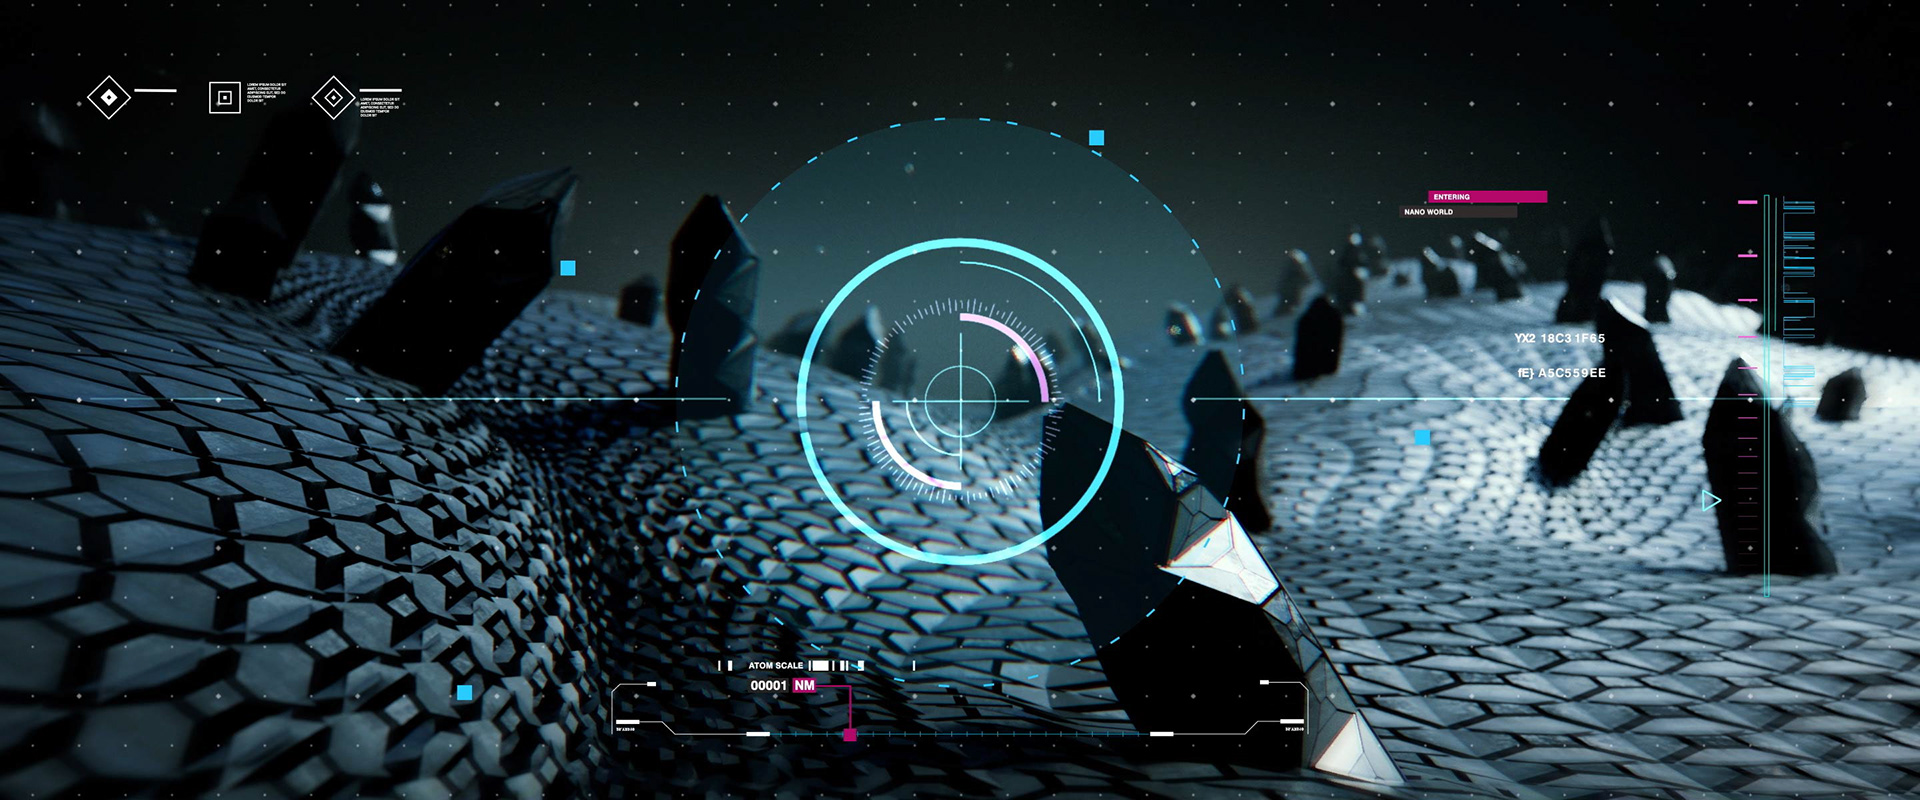 Simon Graham - Future of technology installation film